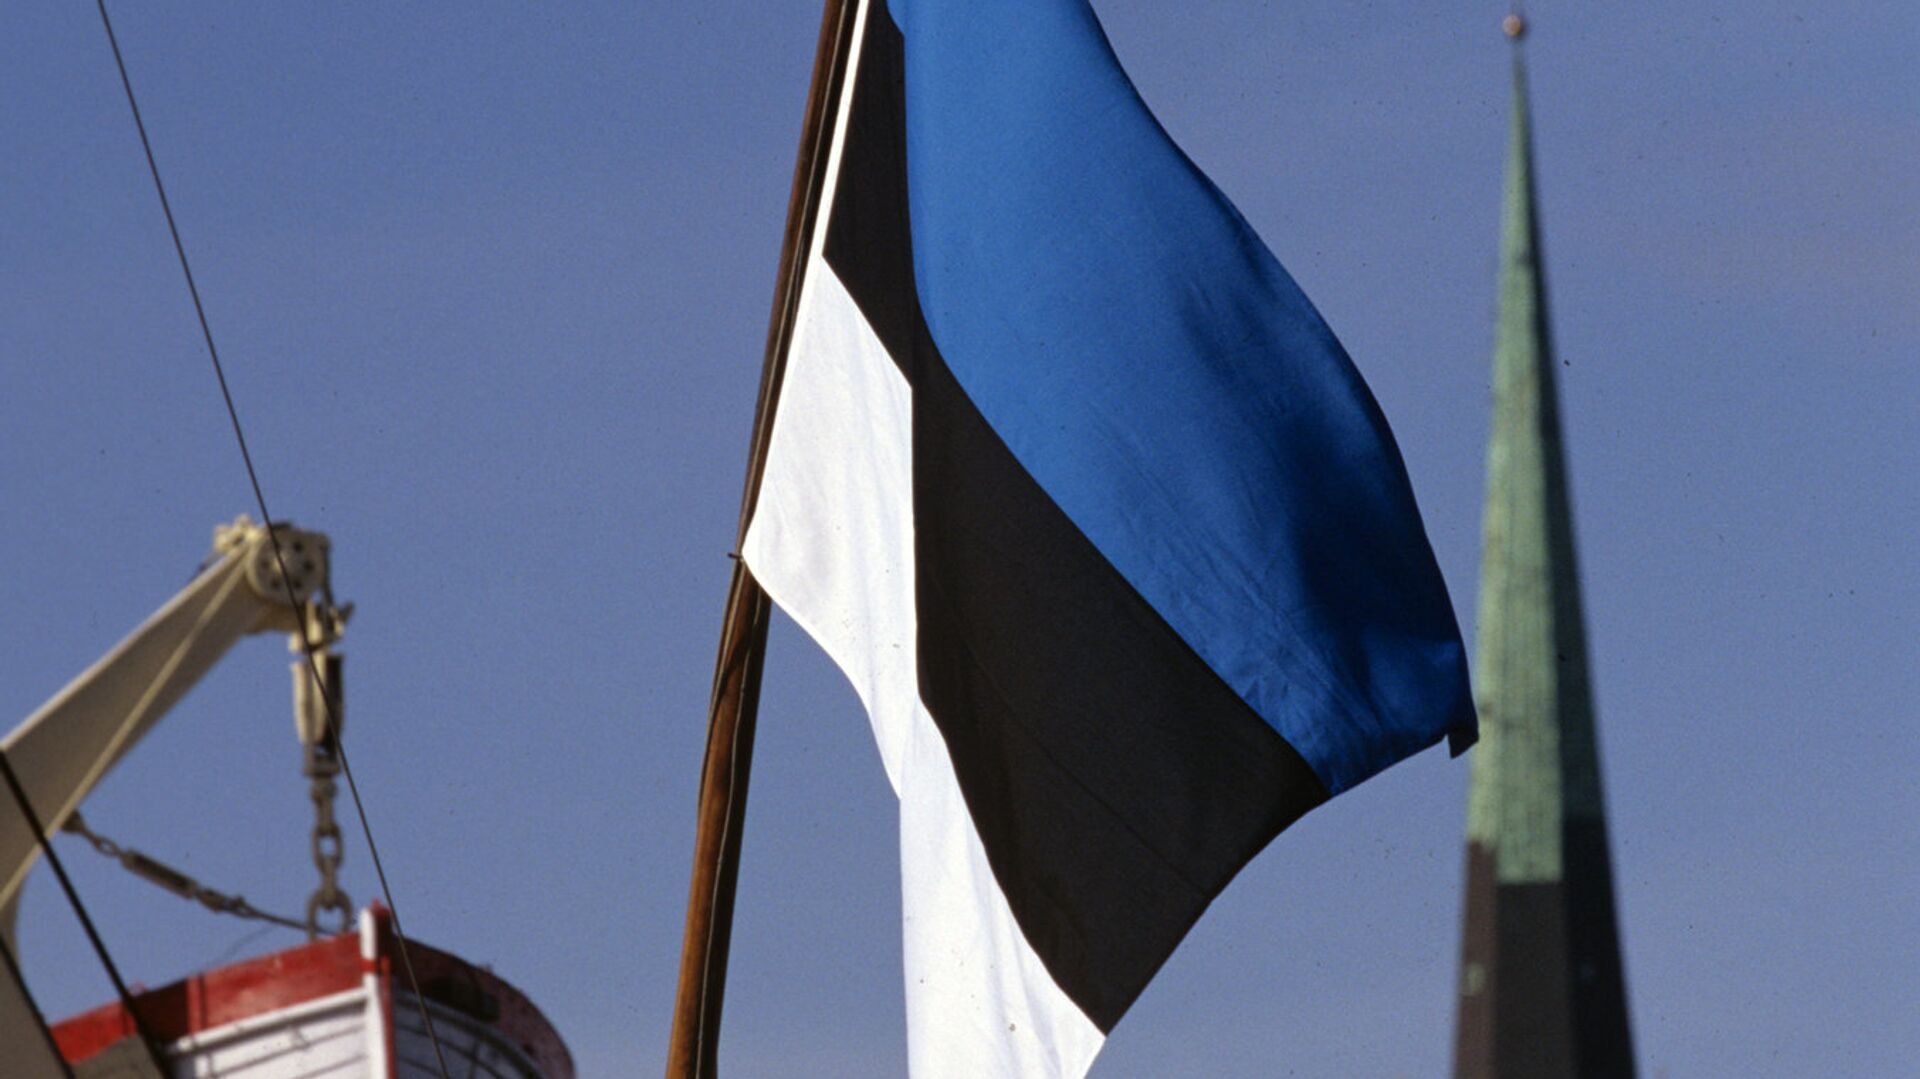 Flaga Estonii - Sputnik Polska, 1920, 31.08.2021